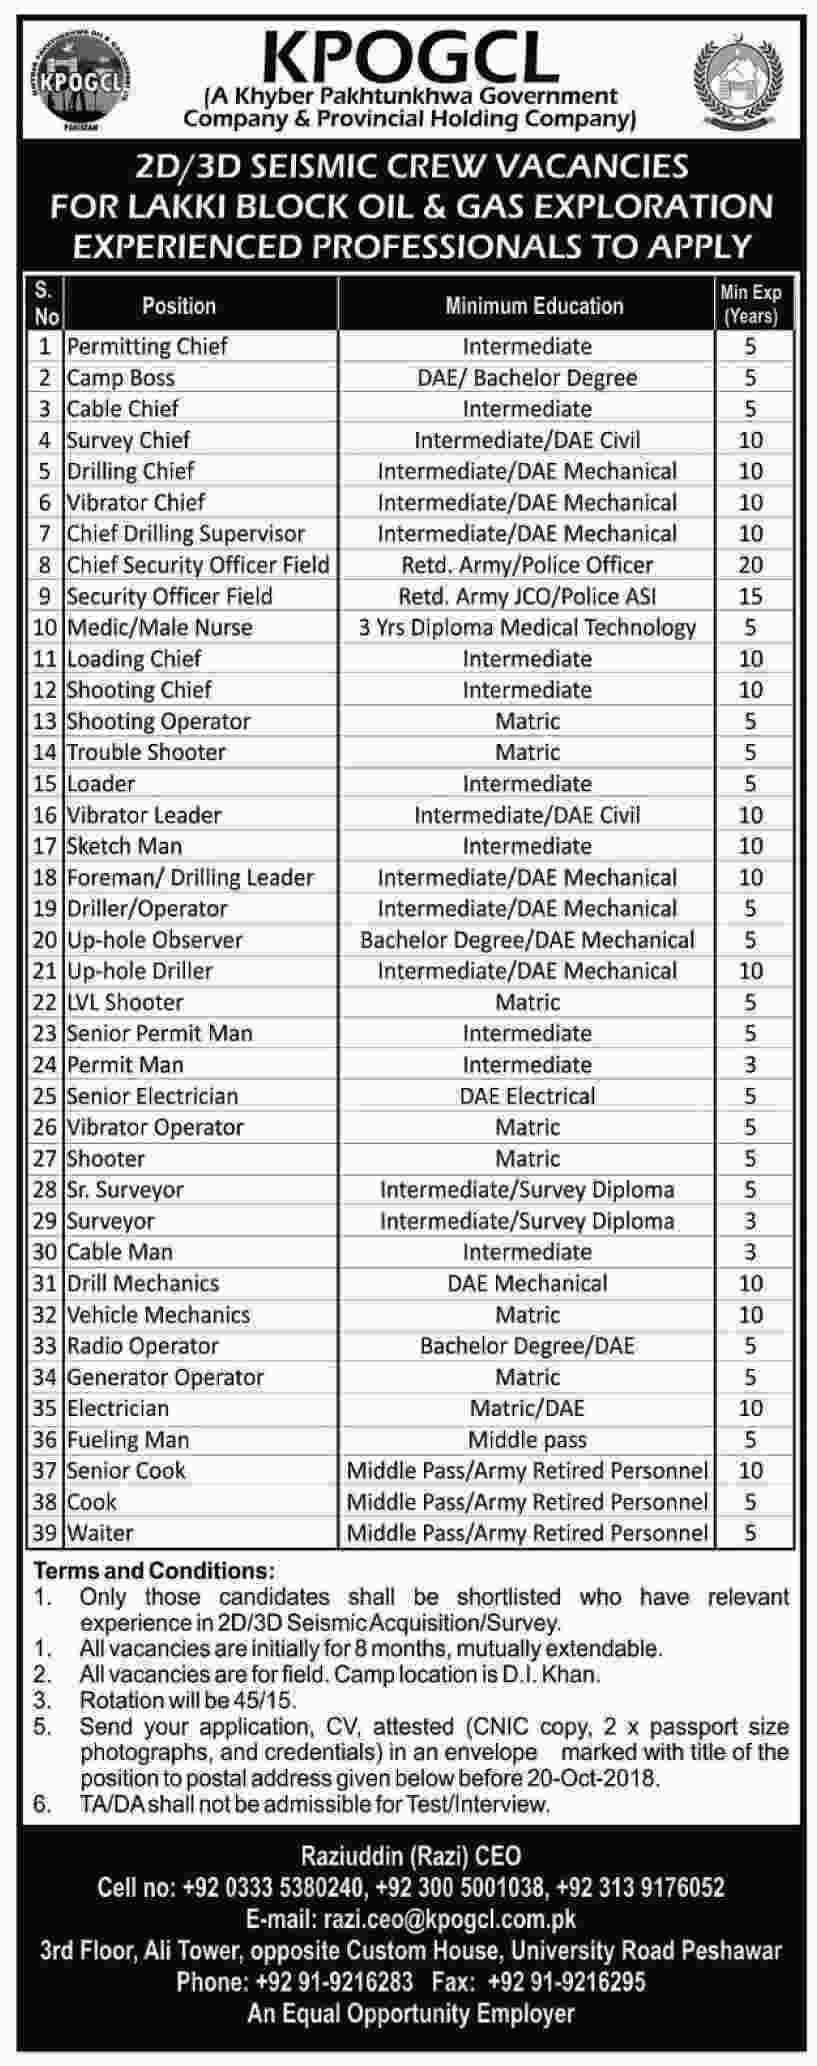 KPOGCL Jobs KP Oil & Gas Company Limited Vacancies